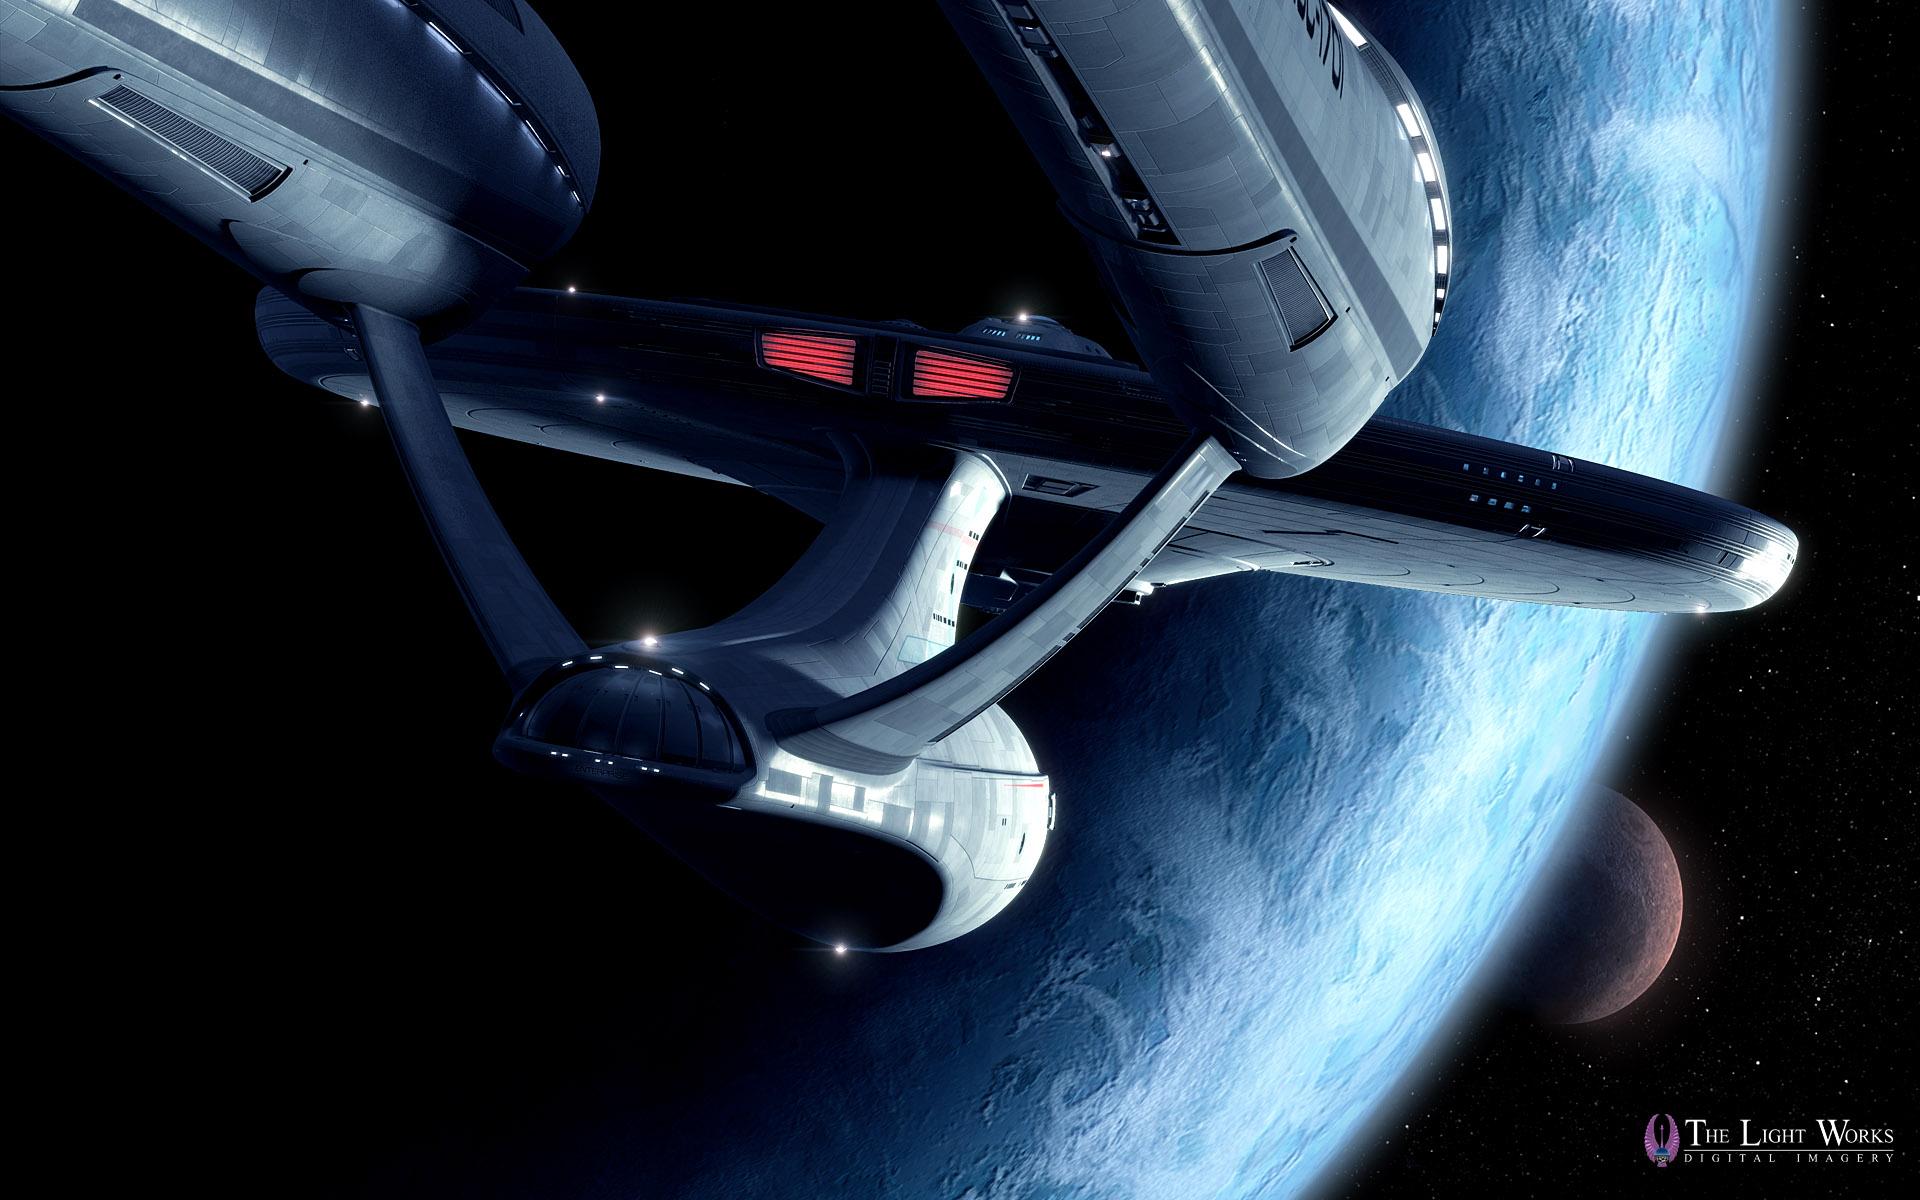 First Look at Tobias Richter's Star Trek Movie USS Enterprise Wallpapers